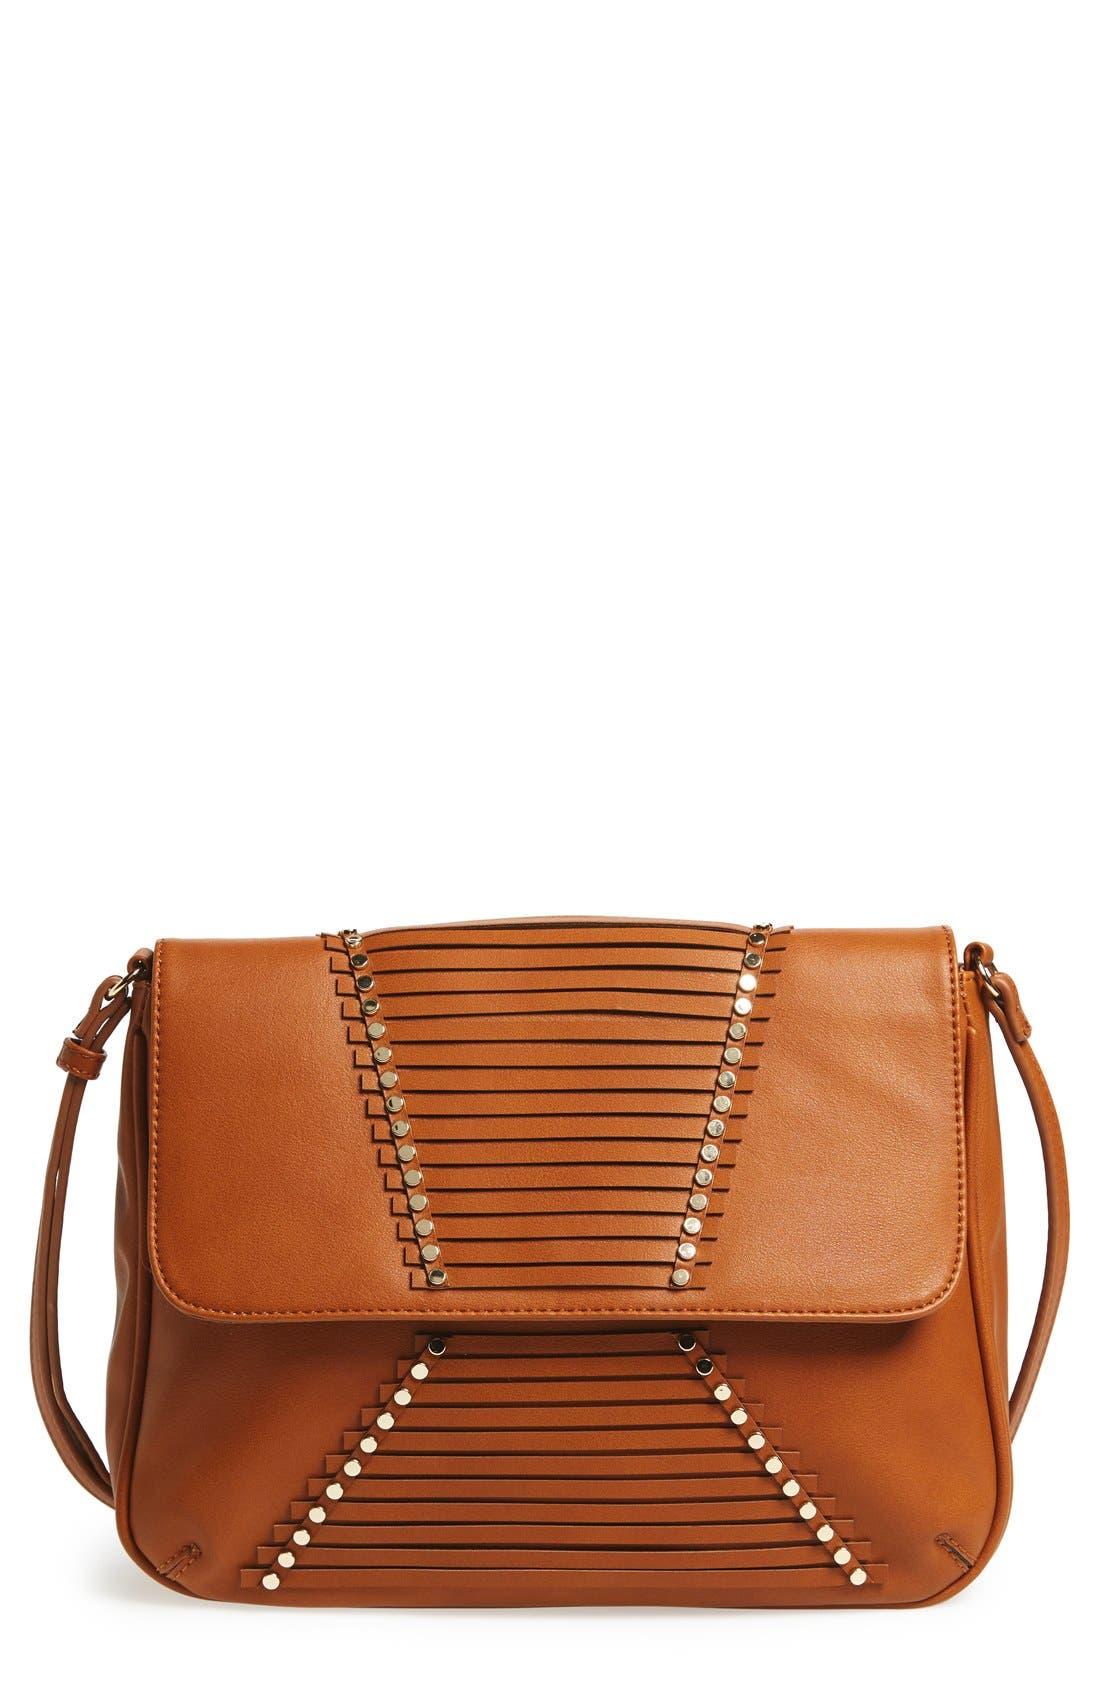 Main Image - Emperia 'Larissa' Studded Flap Faux Leather Crossbody Bag